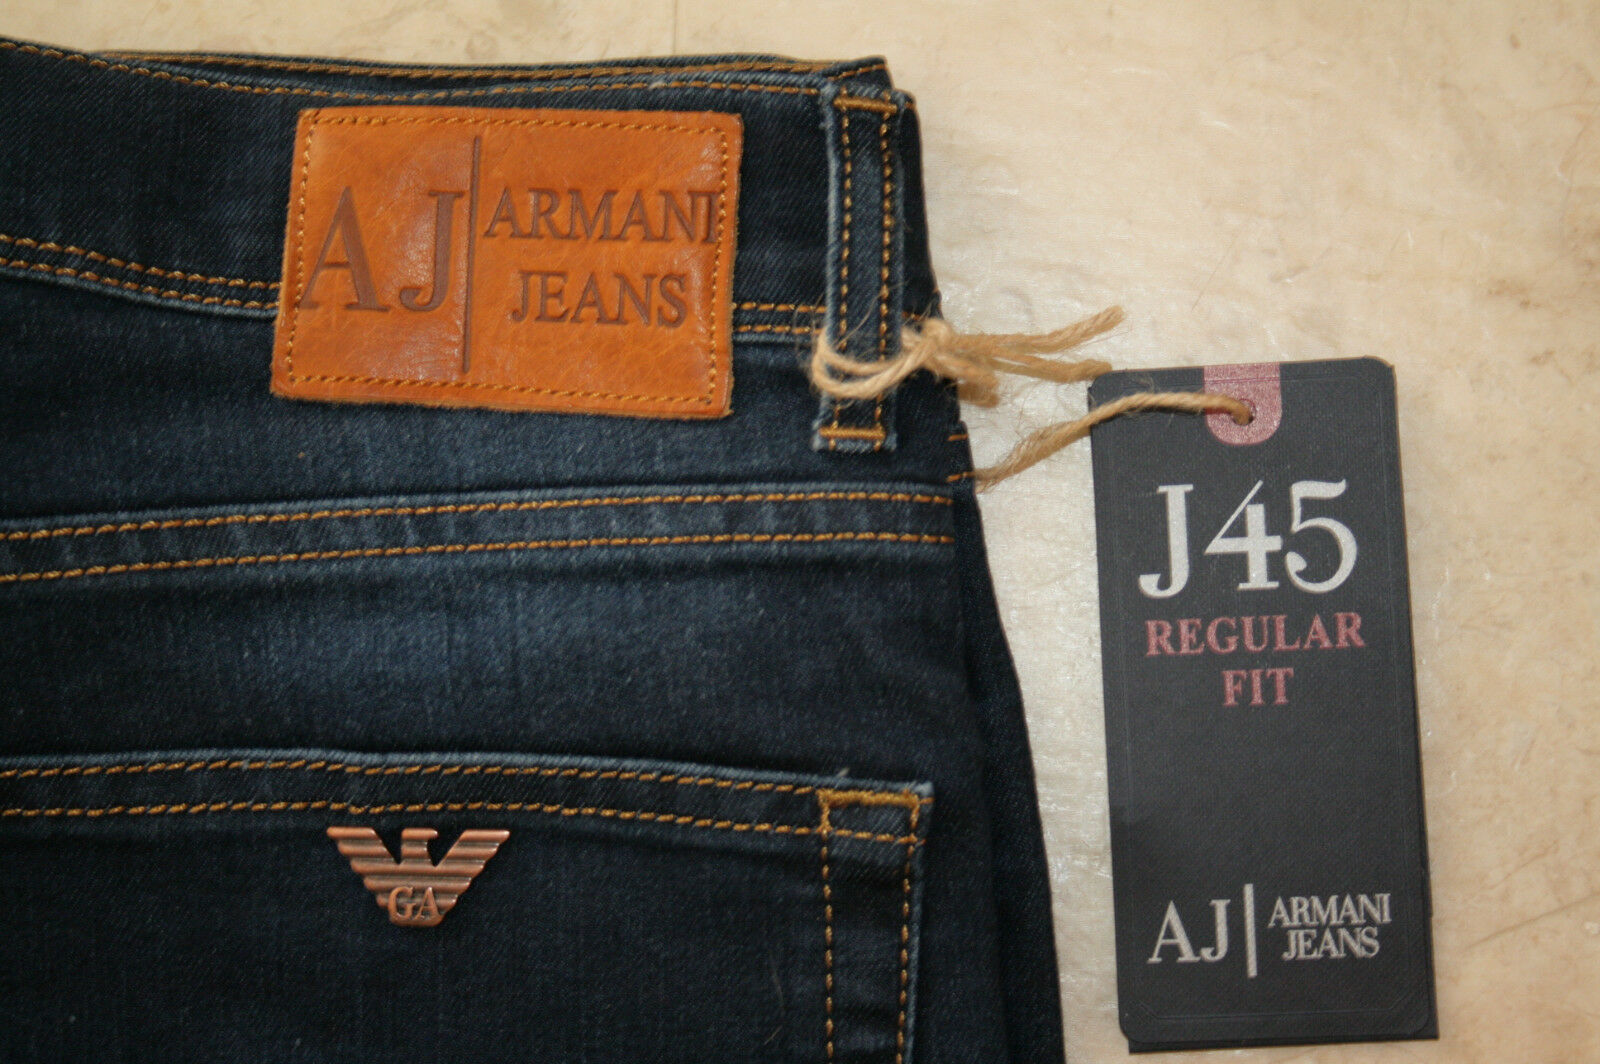 ARMANI J45 JEANS STONEWASH NAVY 30 WAIST 32 LEG